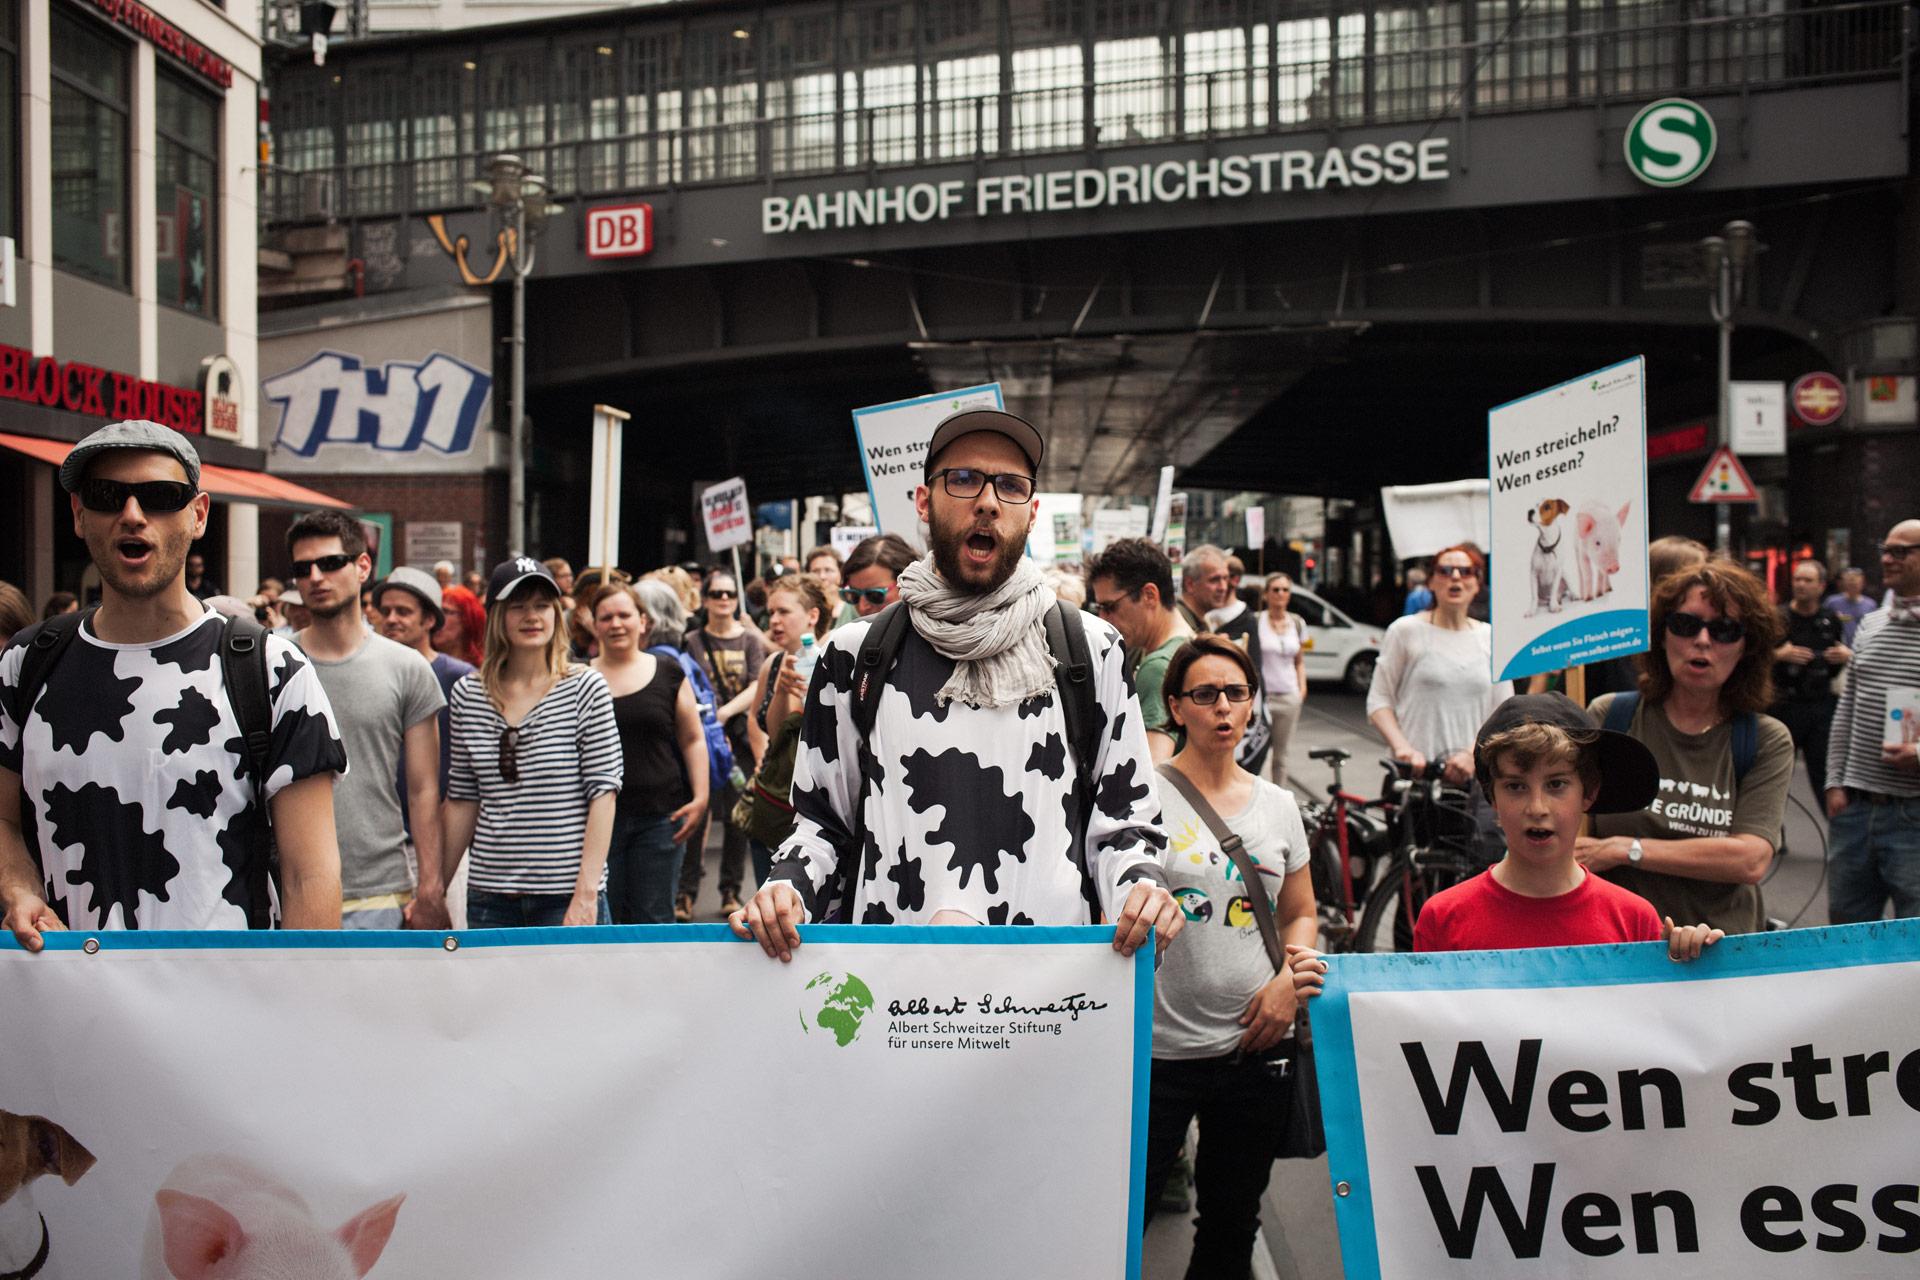 timo-stammberger-photography-fotografie-animal-rights-tierrechte-activism-aktivismus-friedrichstrasse-vegan-compassion